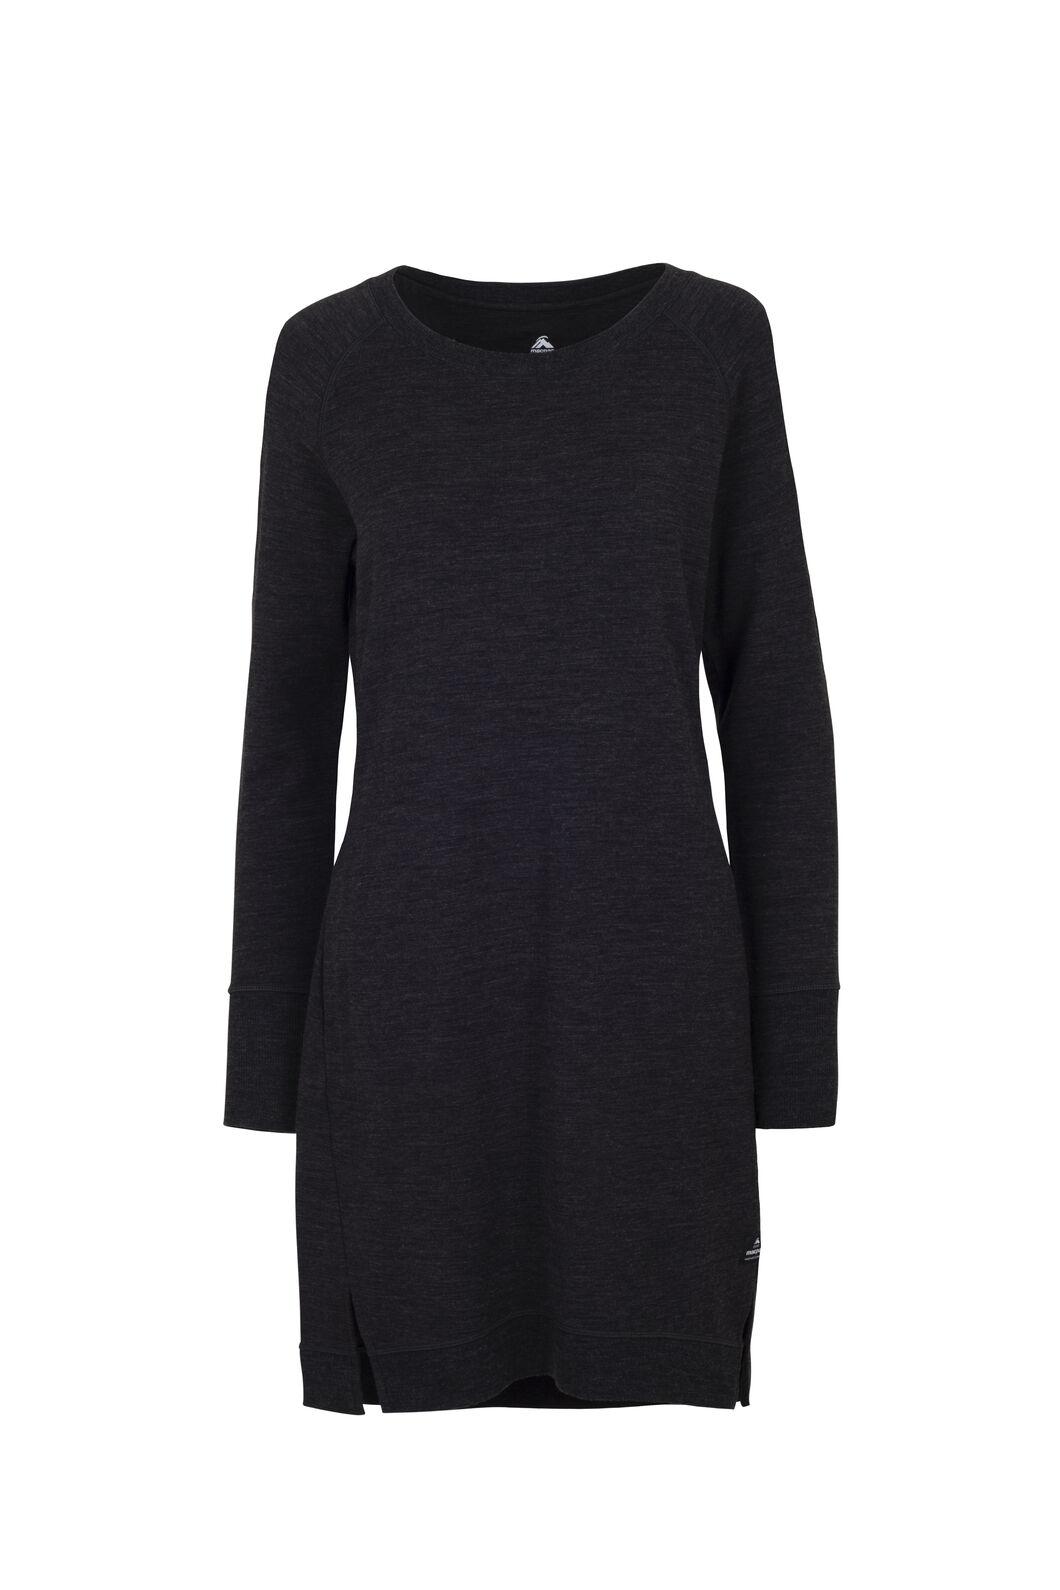 Macpac Platform Merino Dress — Women's, Charcoal Marle, hi-res